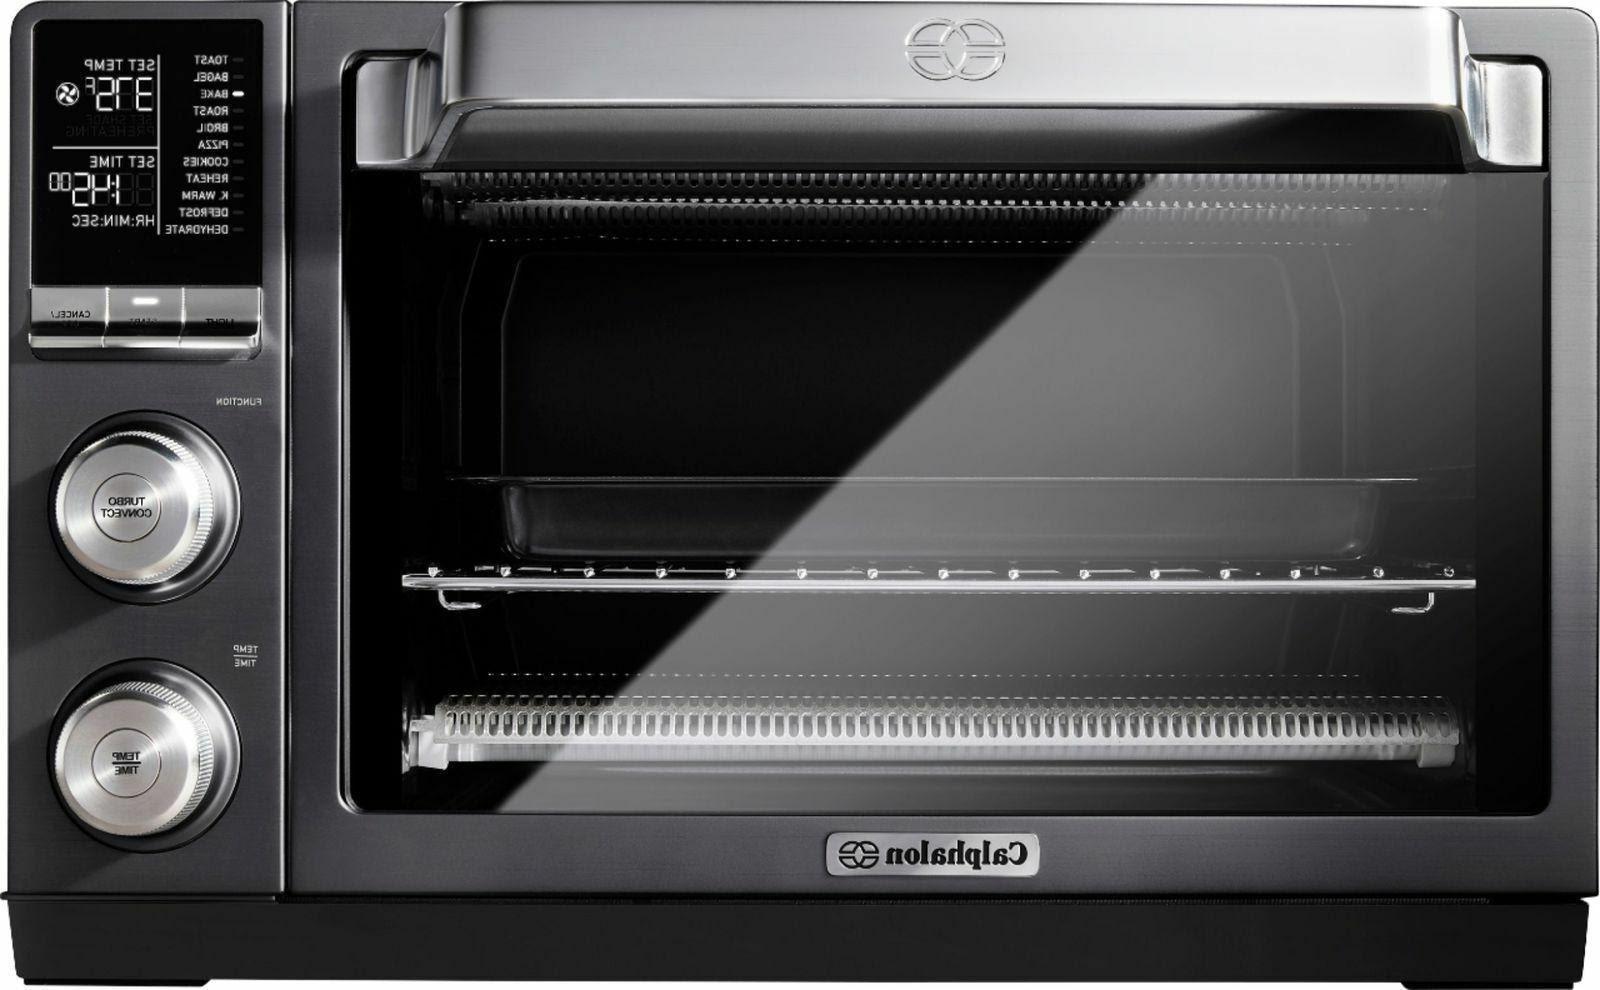 Calphalon Quartz Heat Countertop Toaster Oven, Dark Stainless